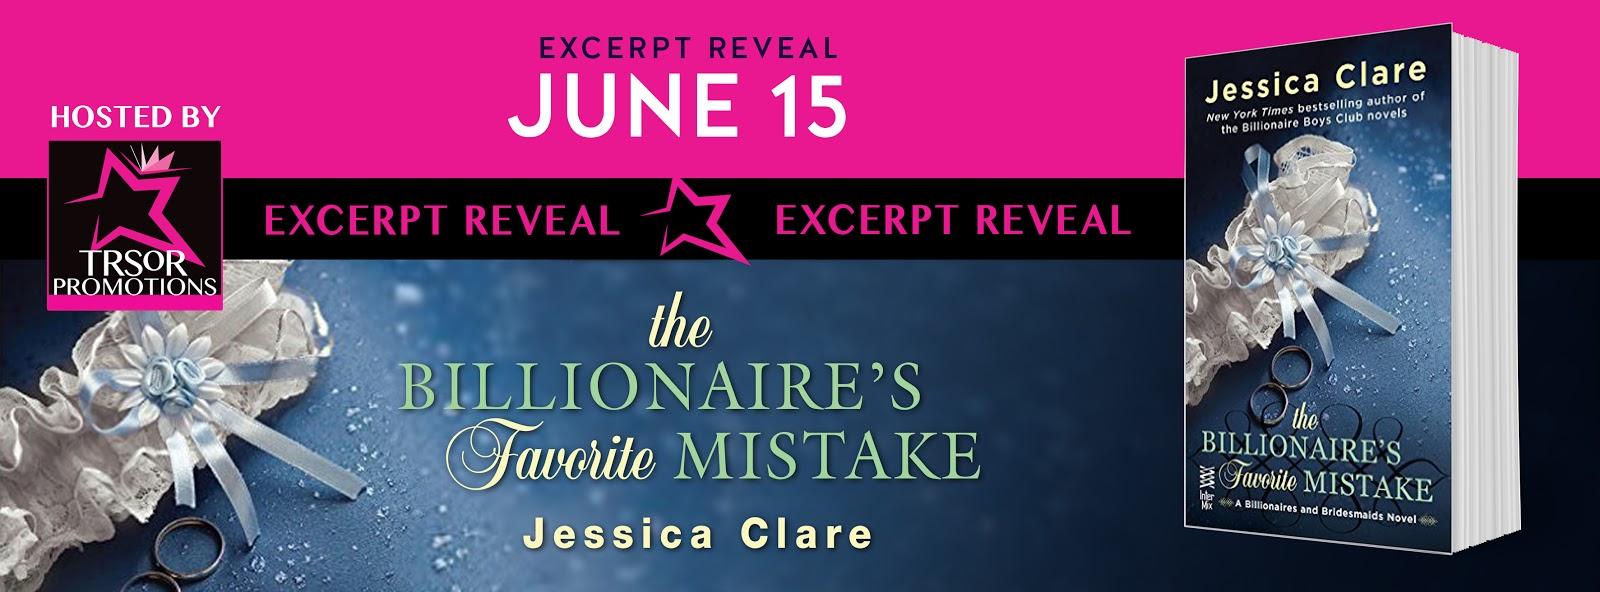 Excerpt: Billionaire's Favorite Mistake by Jessica Clare